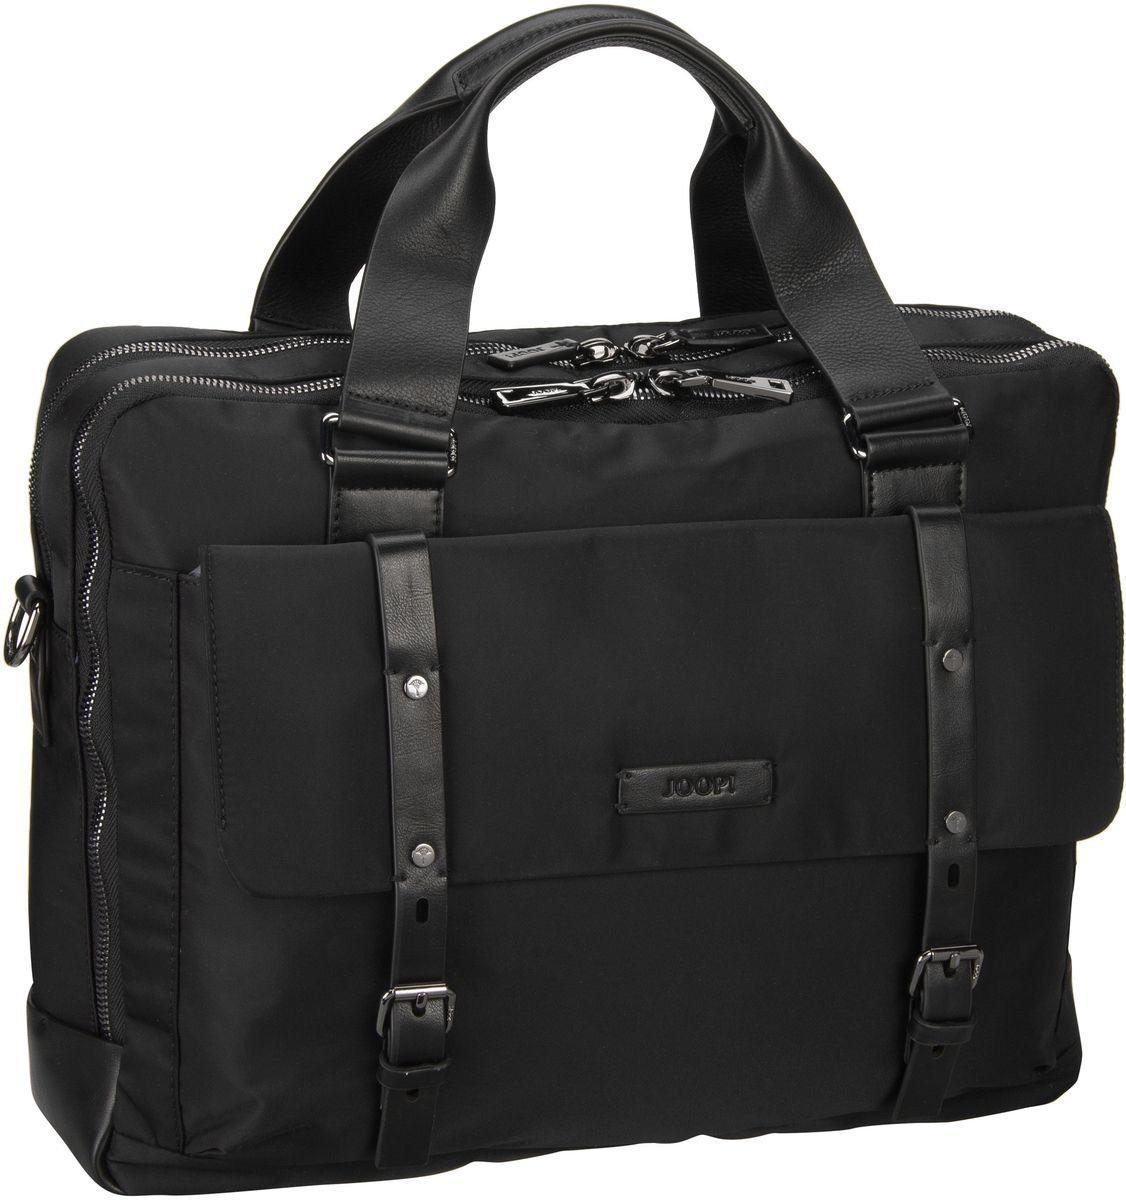 Joop Pandion Nylon Brief Bag Medium